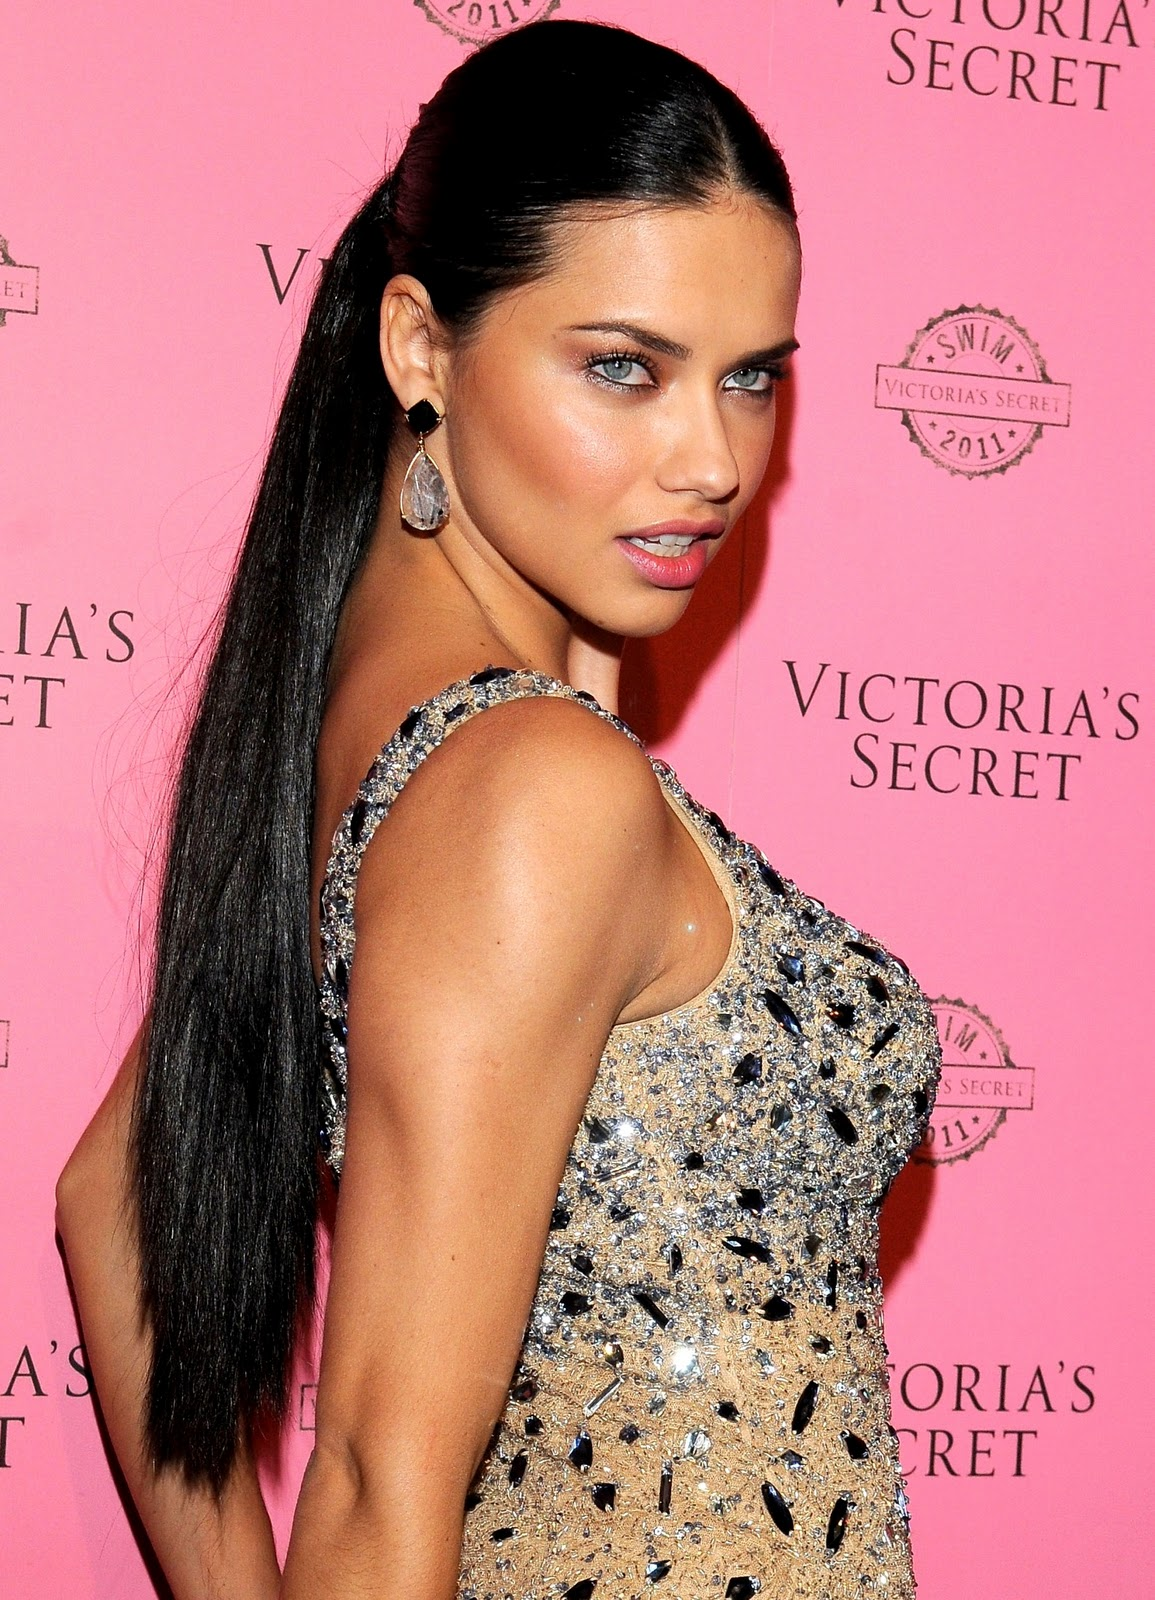 Victoria Secret Adriana